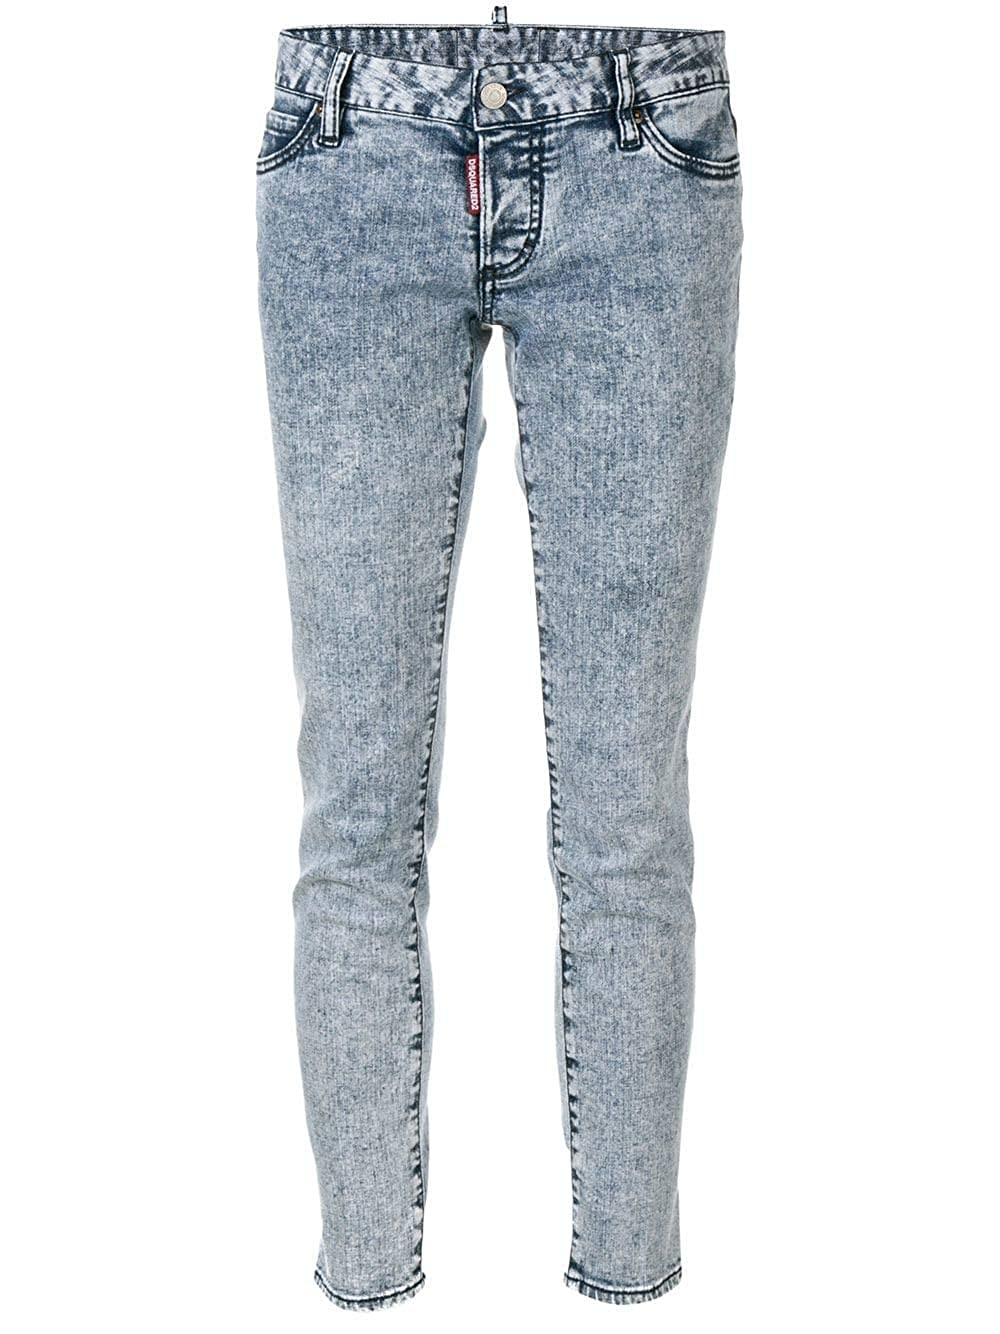 59b0aecf9f DSQUARED2 Mujer S72LB0174S30342470 Gris Algodon Jeans  Amazon.es  Ropa y  accesorios